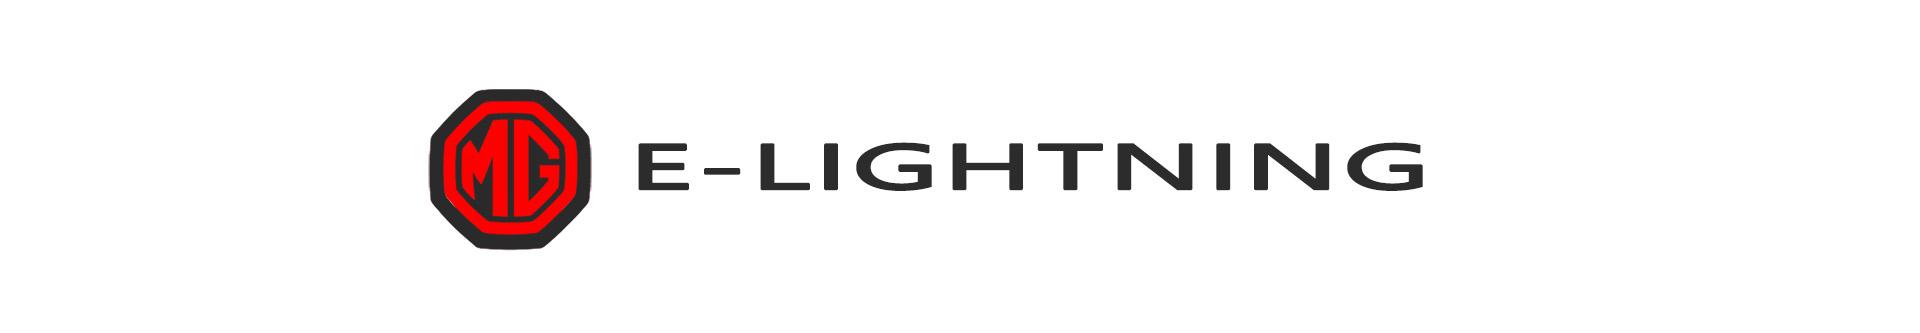 MG E-Lightning 虚拟竞速概念超跑